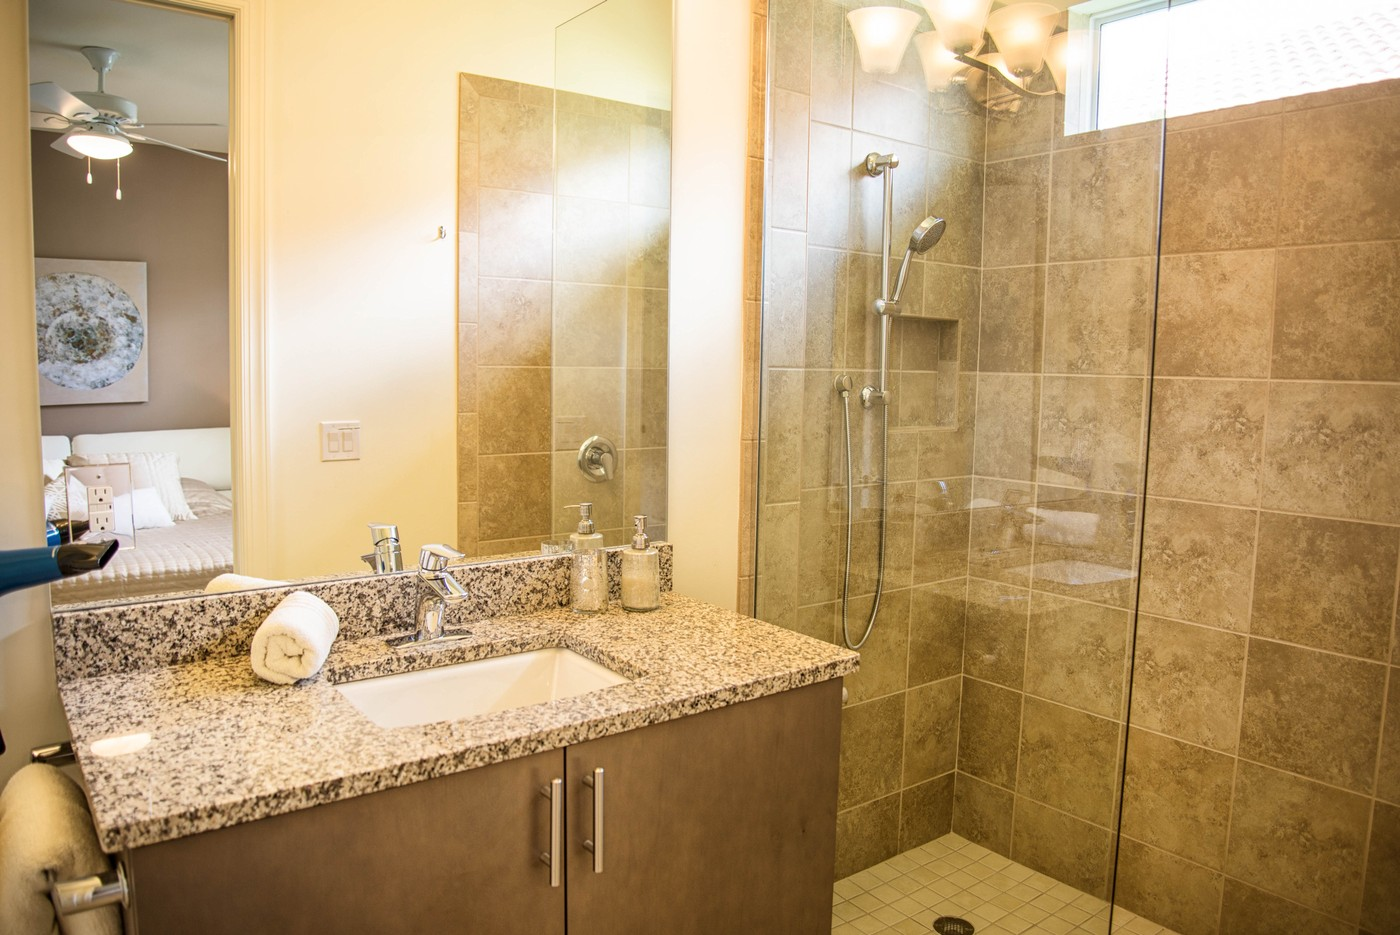 Bathrooms in Cape Coral